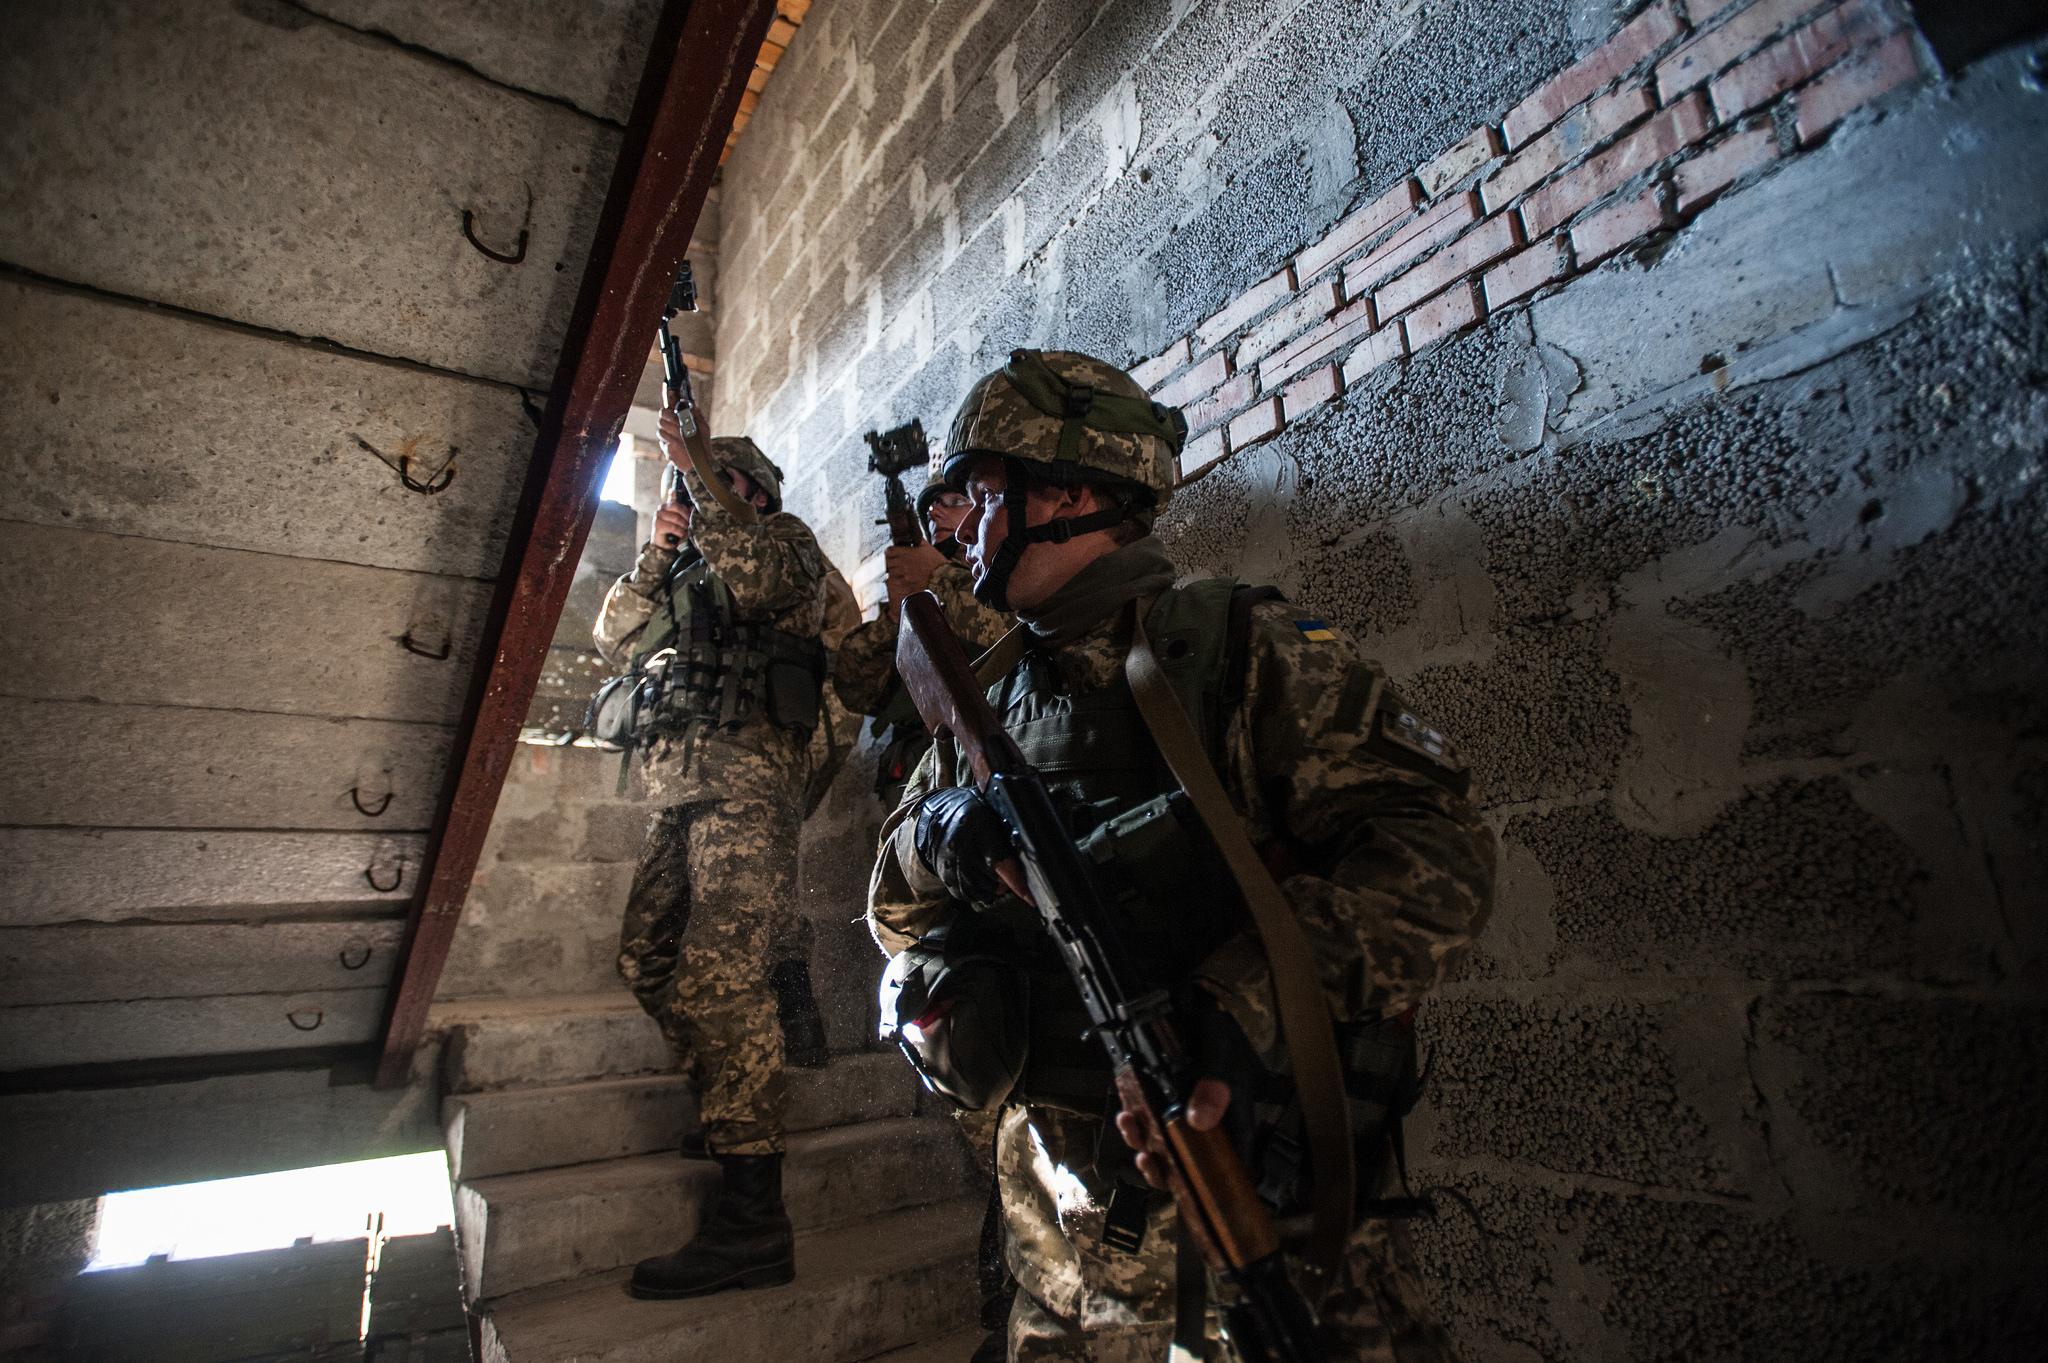 Foto: Rapid Trident / www.eur.army.mil